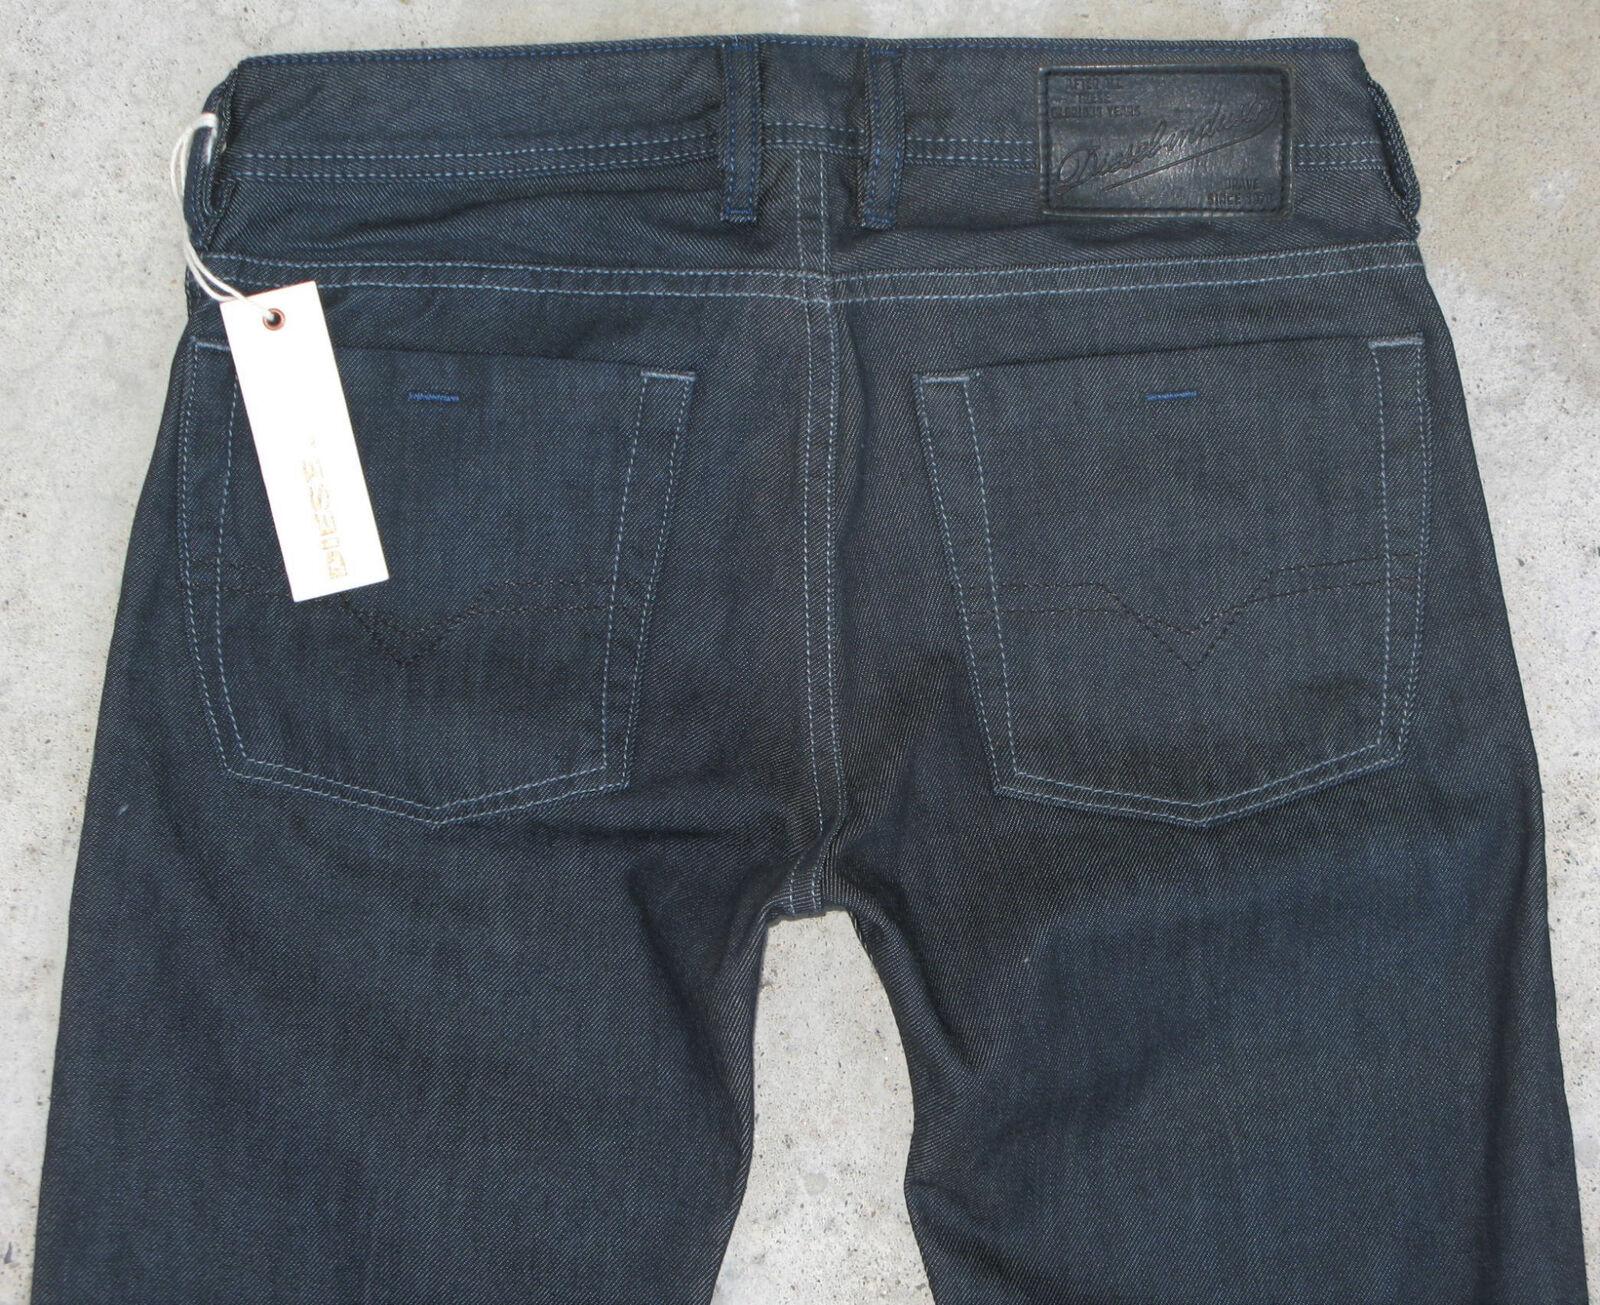 Diesel Mens Zatiny Bootcut Jeans Sz 27 X 32 NEW  Dark Wash 88Z